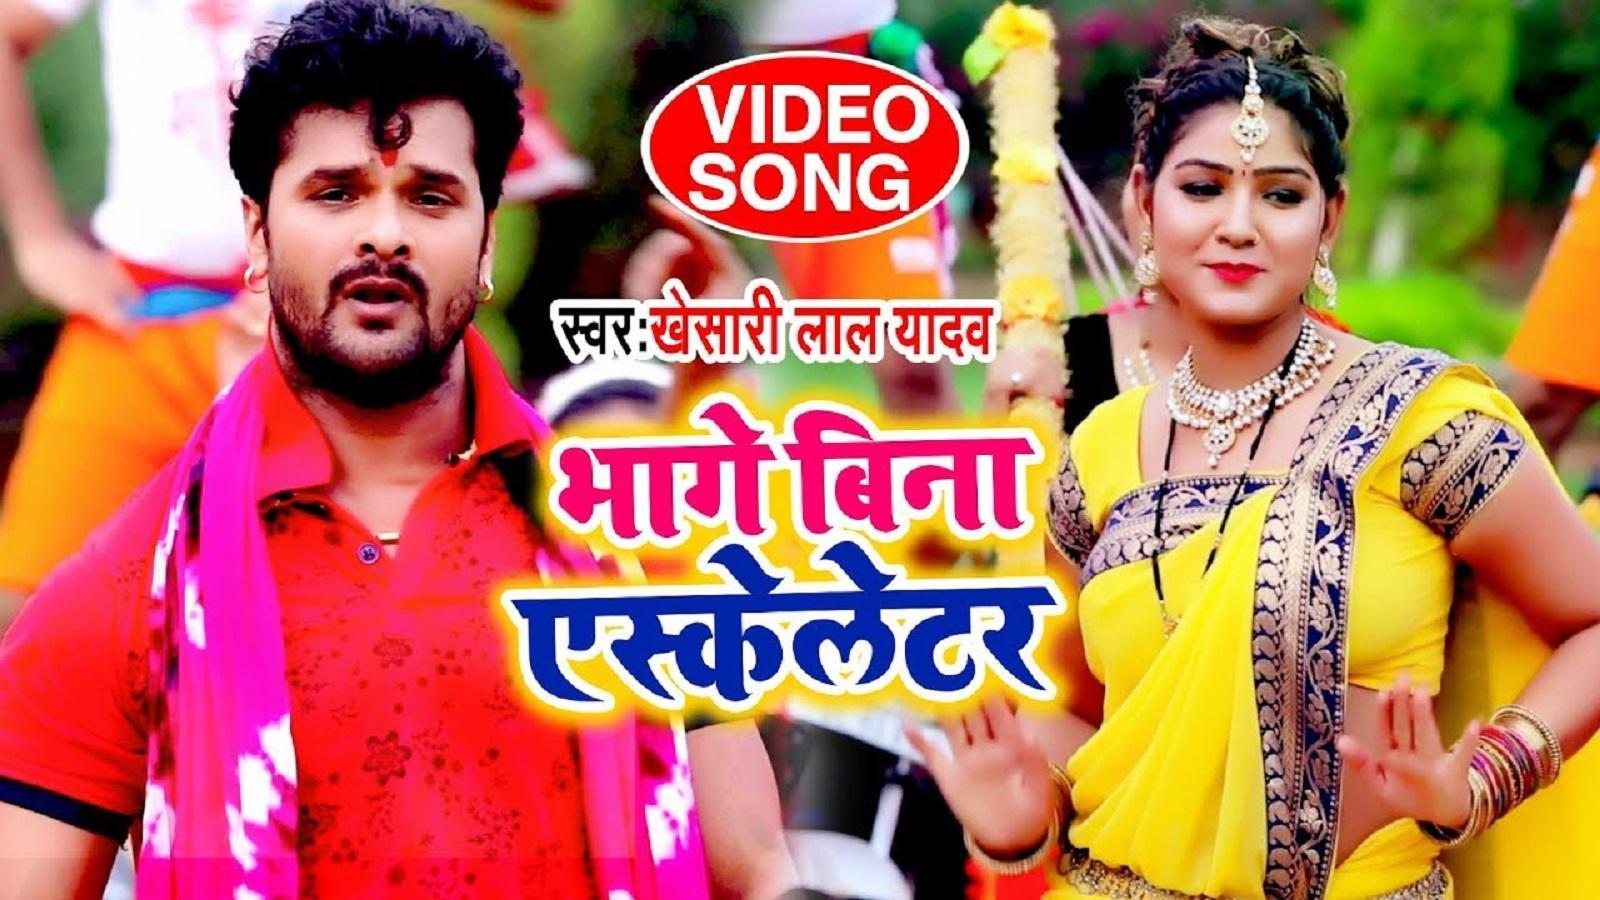 Bol Bam Song 2019: Latest Bhojpuri song 'Bhage Bina Askeletar' sung by  Khesari Lal Yadav